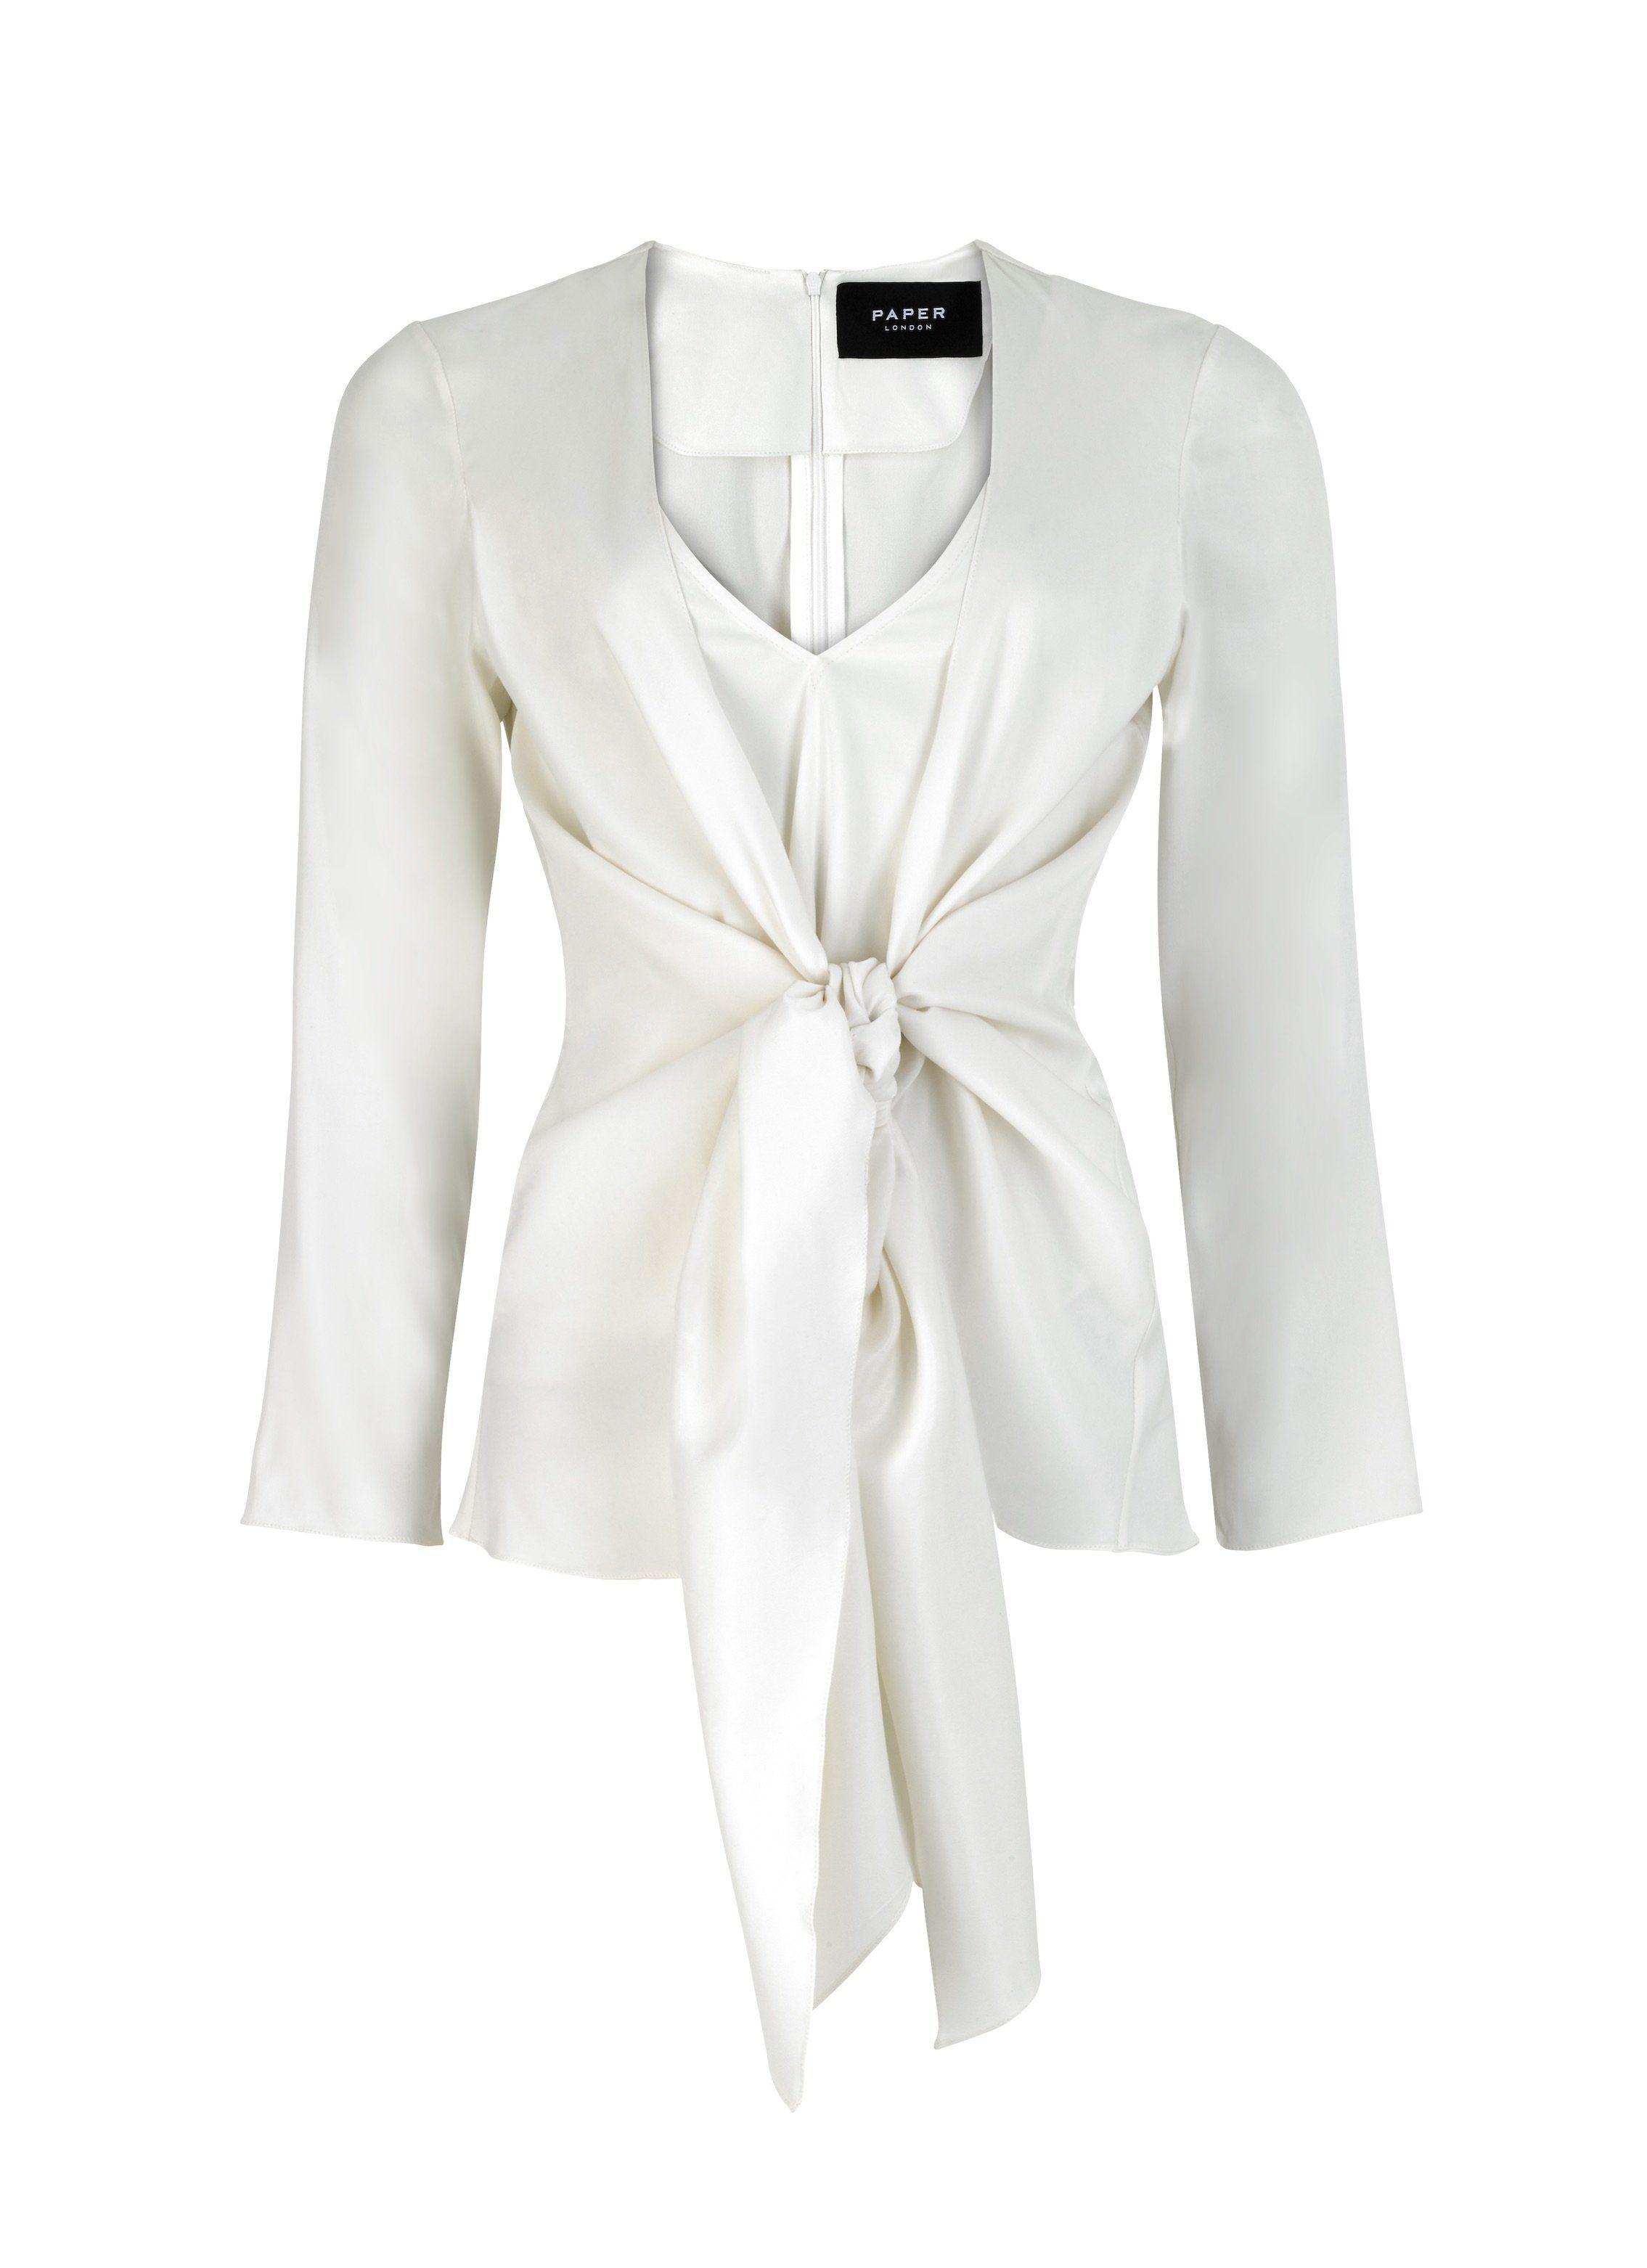 fc6570c1f18c54 Best White Shirts | Best high street buys | Shopping